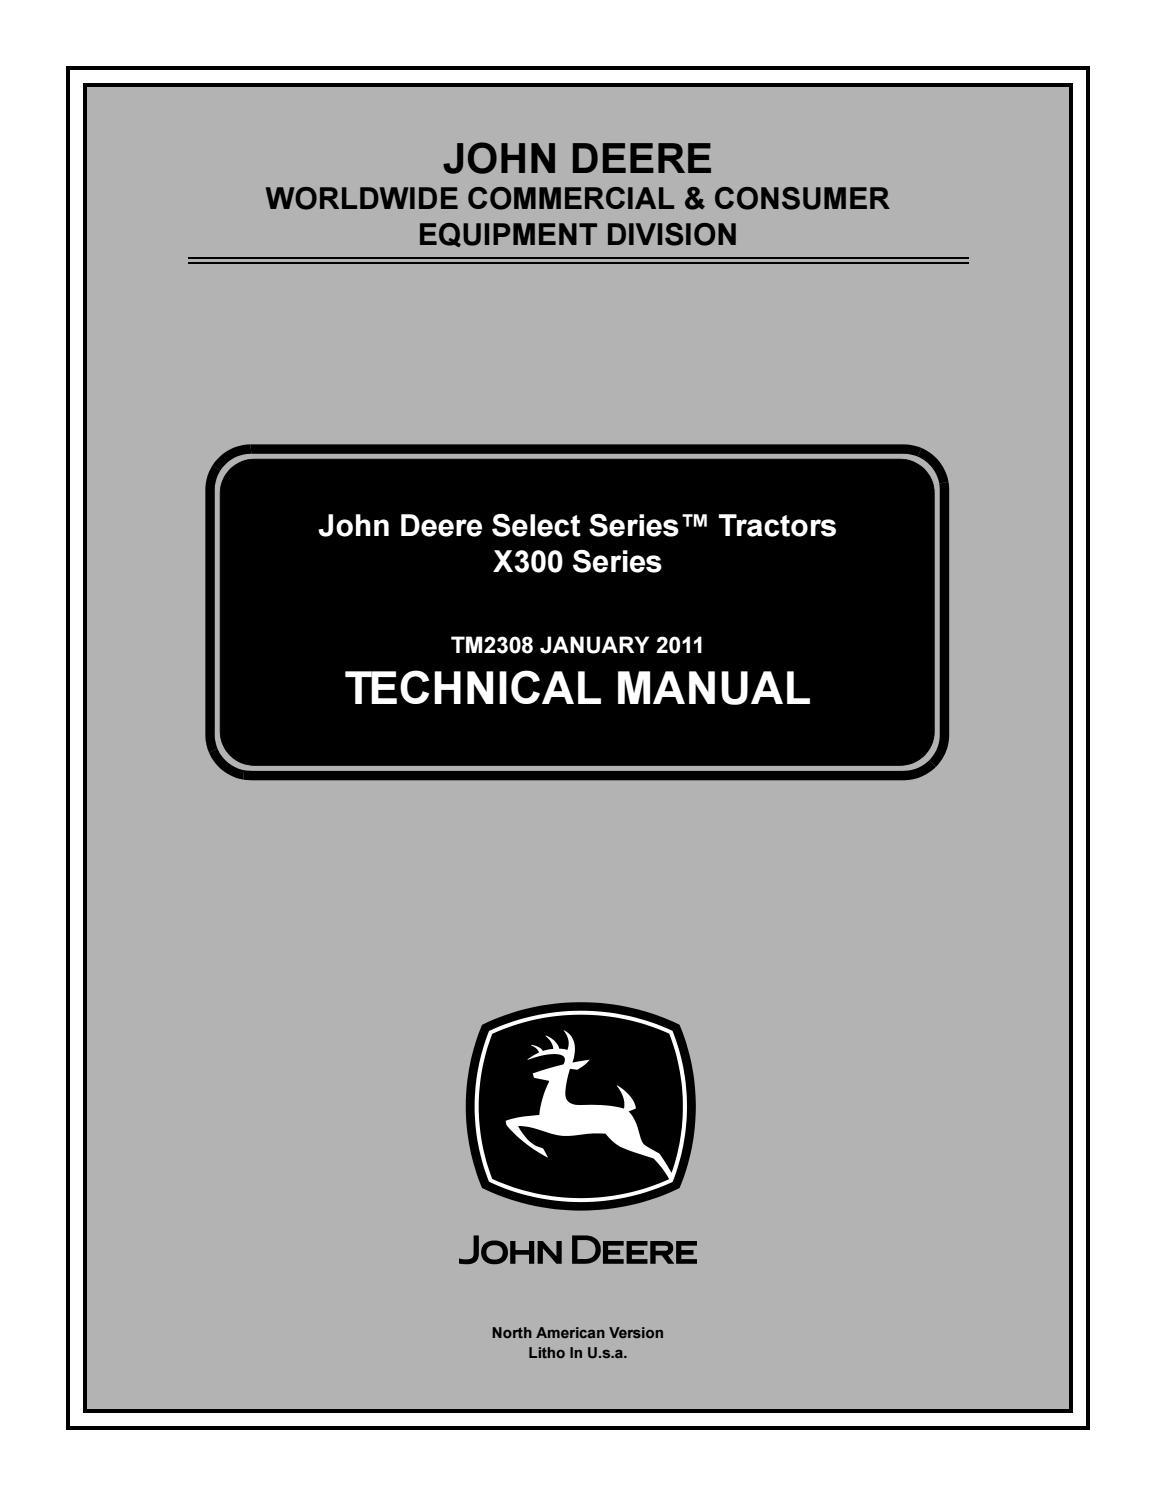 John deere x320 lawn tractor service repair manual by kjsmfmmf - issuu | X320 Wiring Diagram |  | Issuu